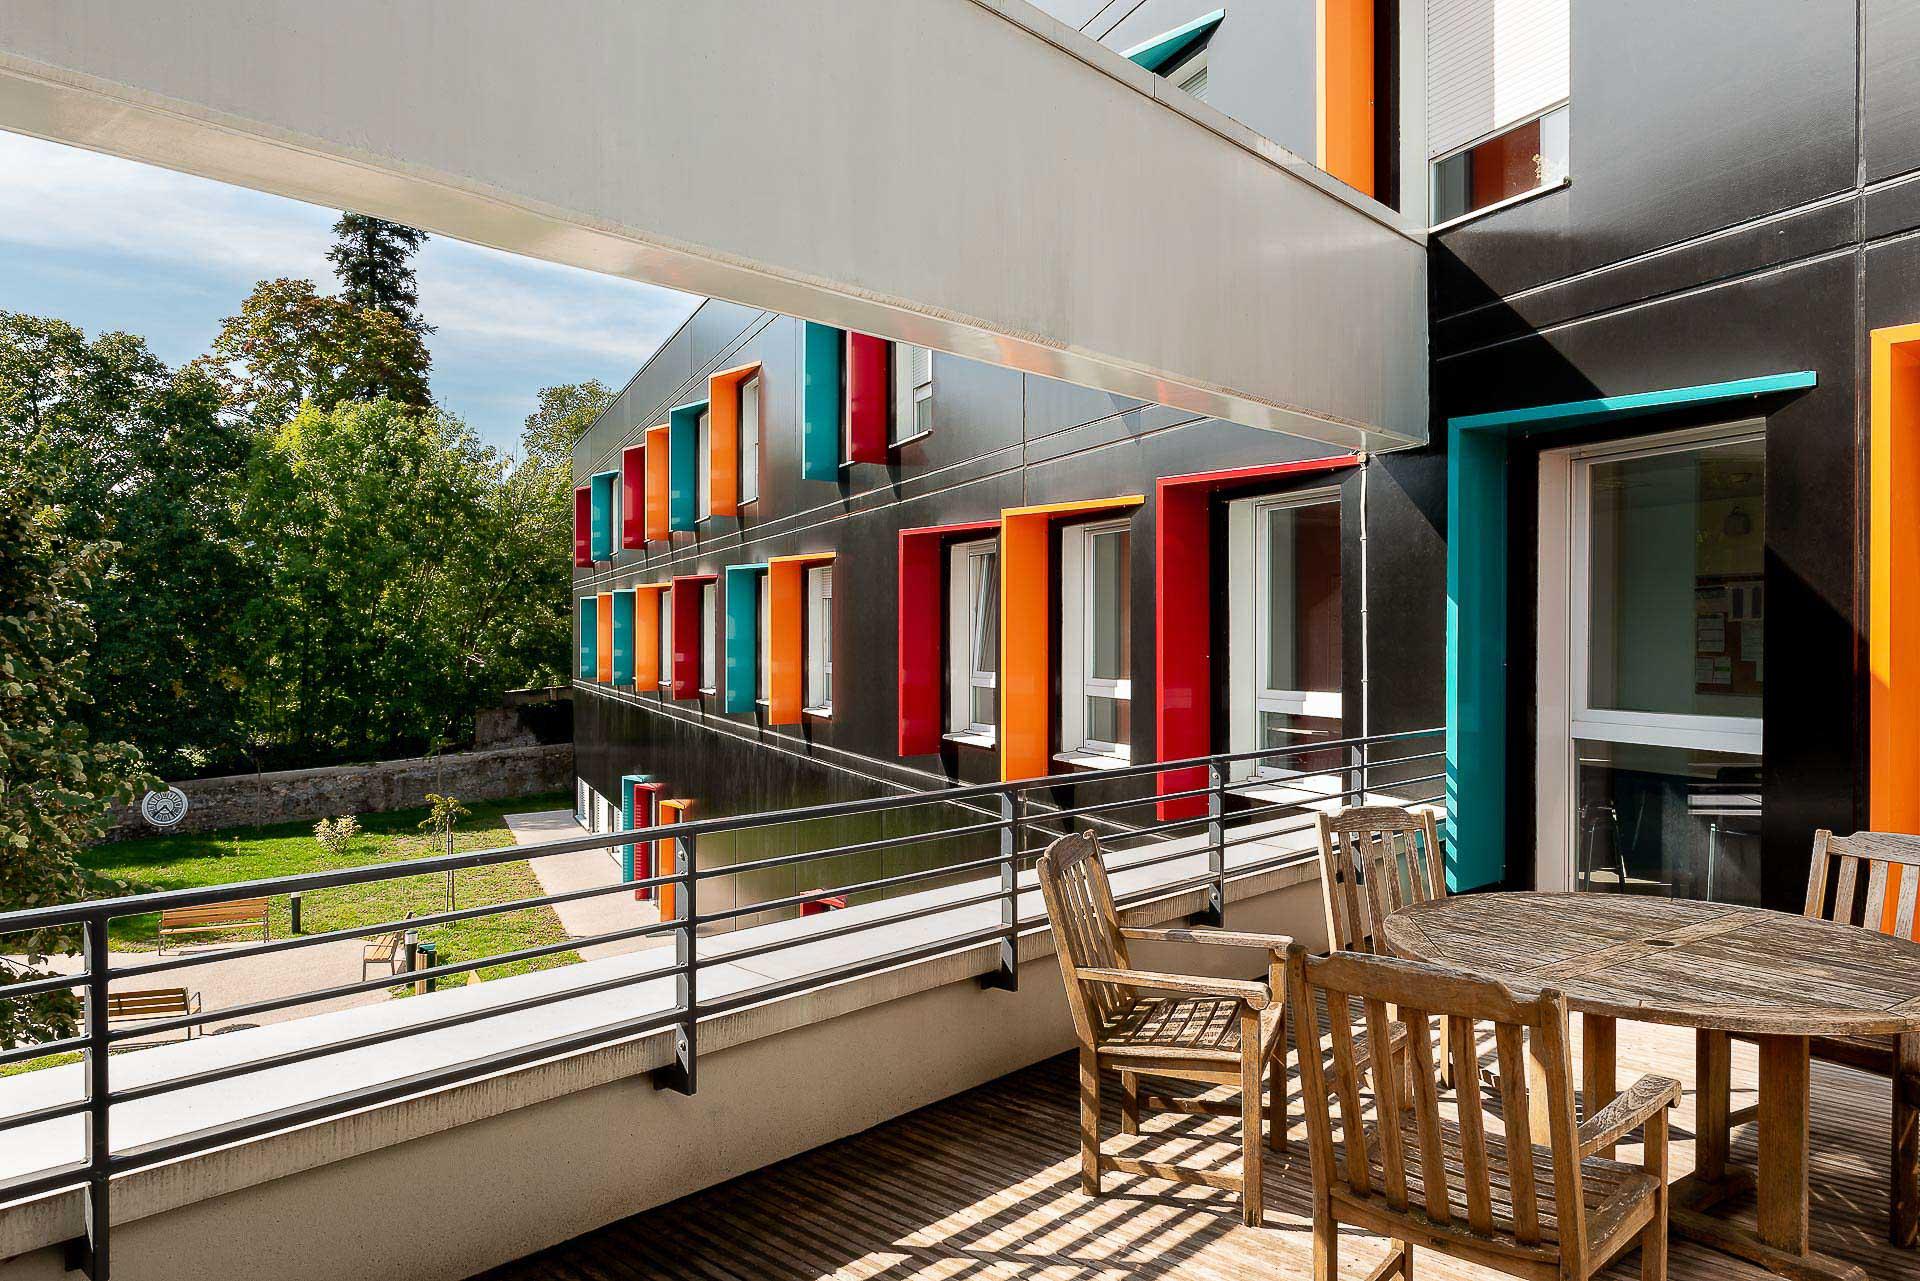 Hôpital de Tullins en Isère